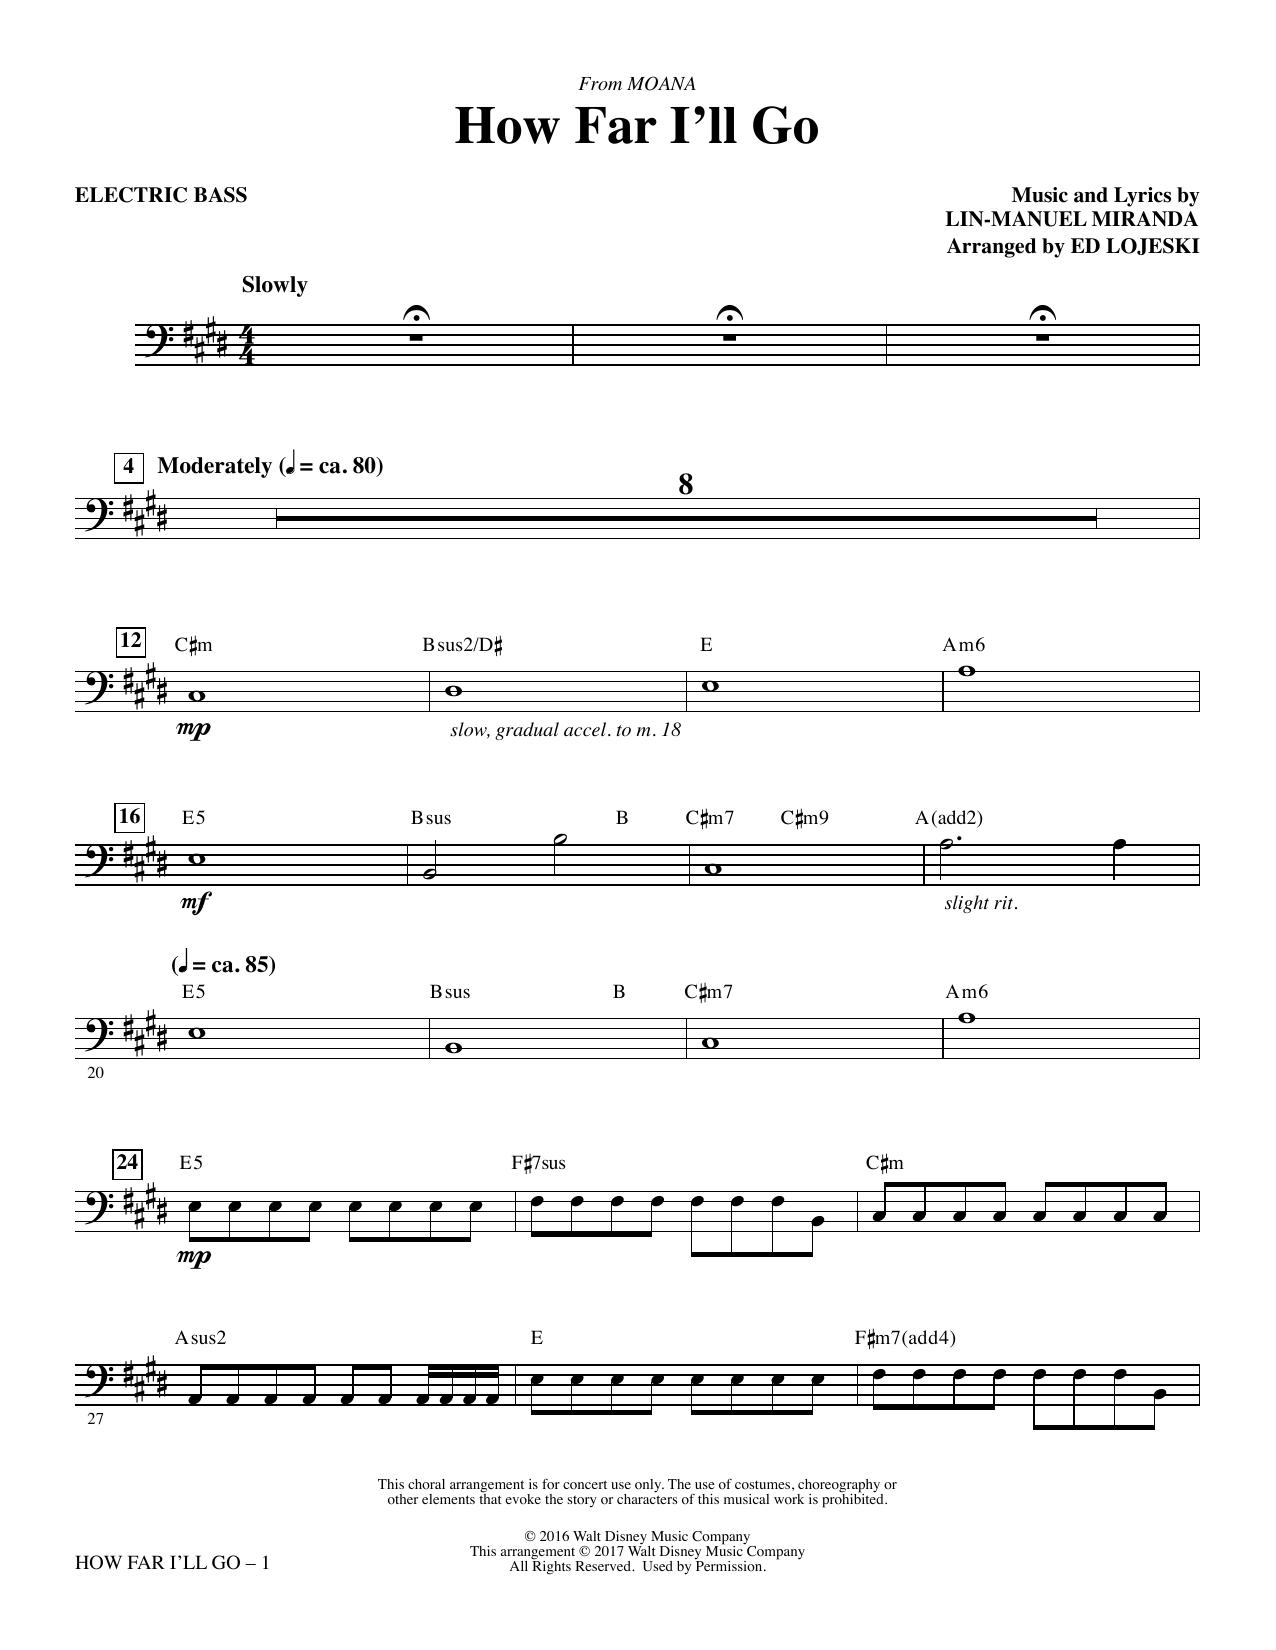 How Far I'll Go (from Moana) - Electric Bass Sheet Music